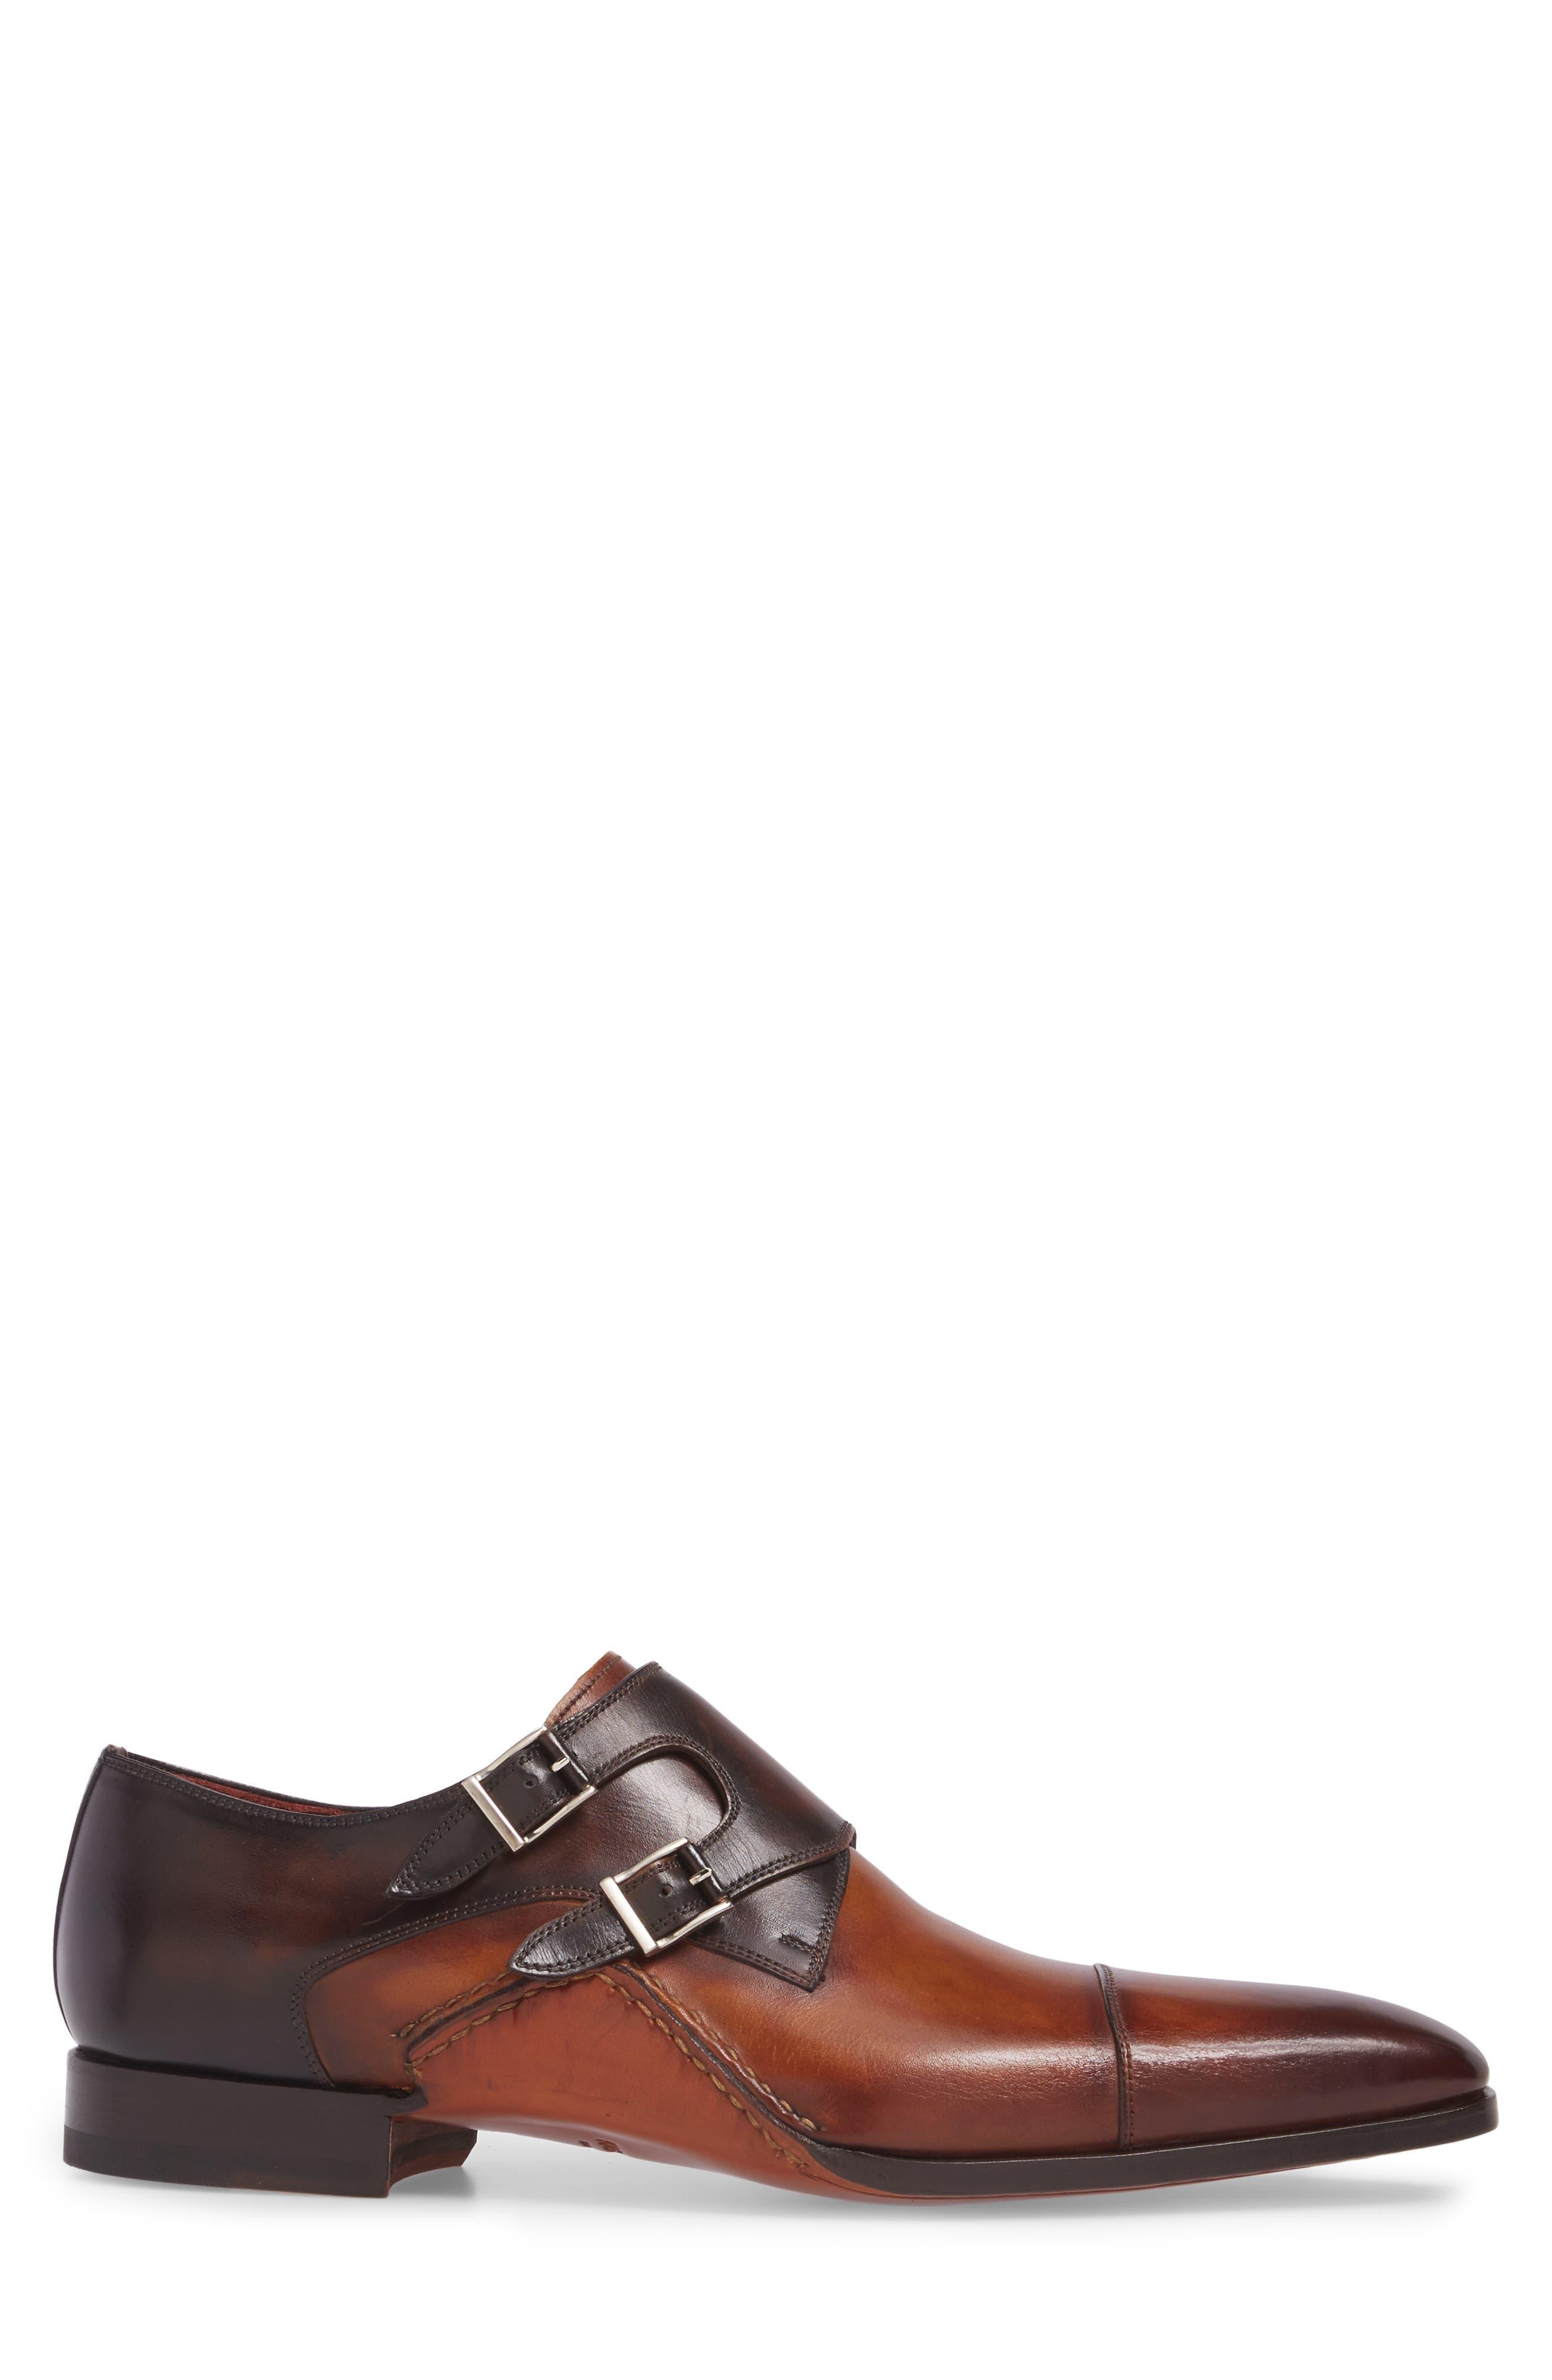 MAGNANNI,                             Ondara Double Monk Strap Shoe,                             Alternate thumbnail 3, color,                             CUERO/ BROWN LEATHER